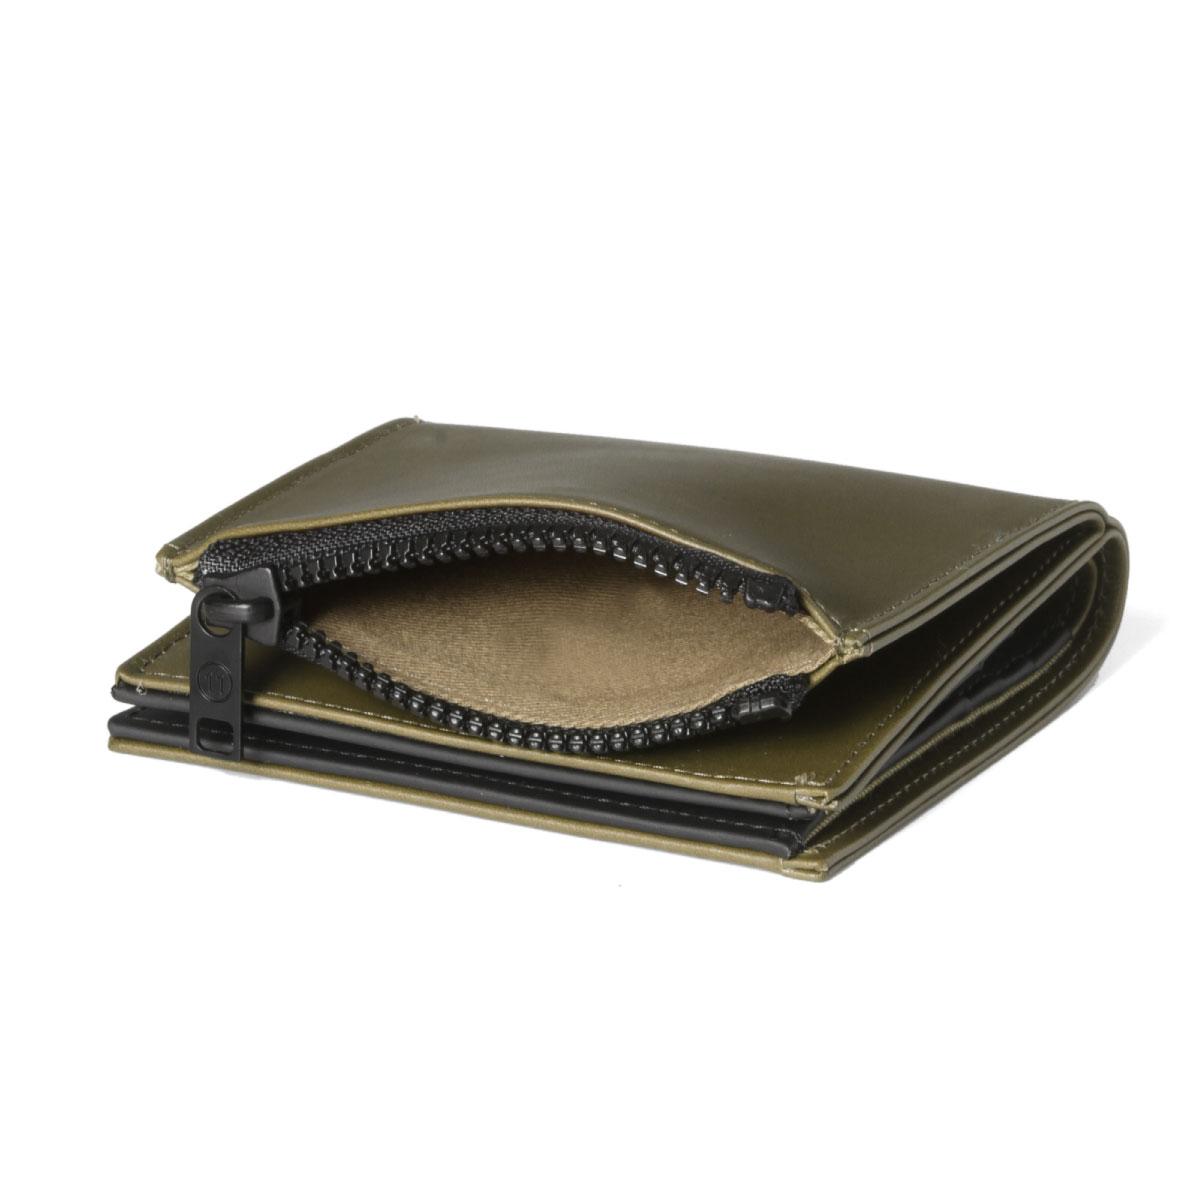 796d9b6c メゾンマルジェラ MAISON MARGIELA wallet men S35UI0438 PS935 T7429 line 11 folio  wallet KHAKI/BLACK green